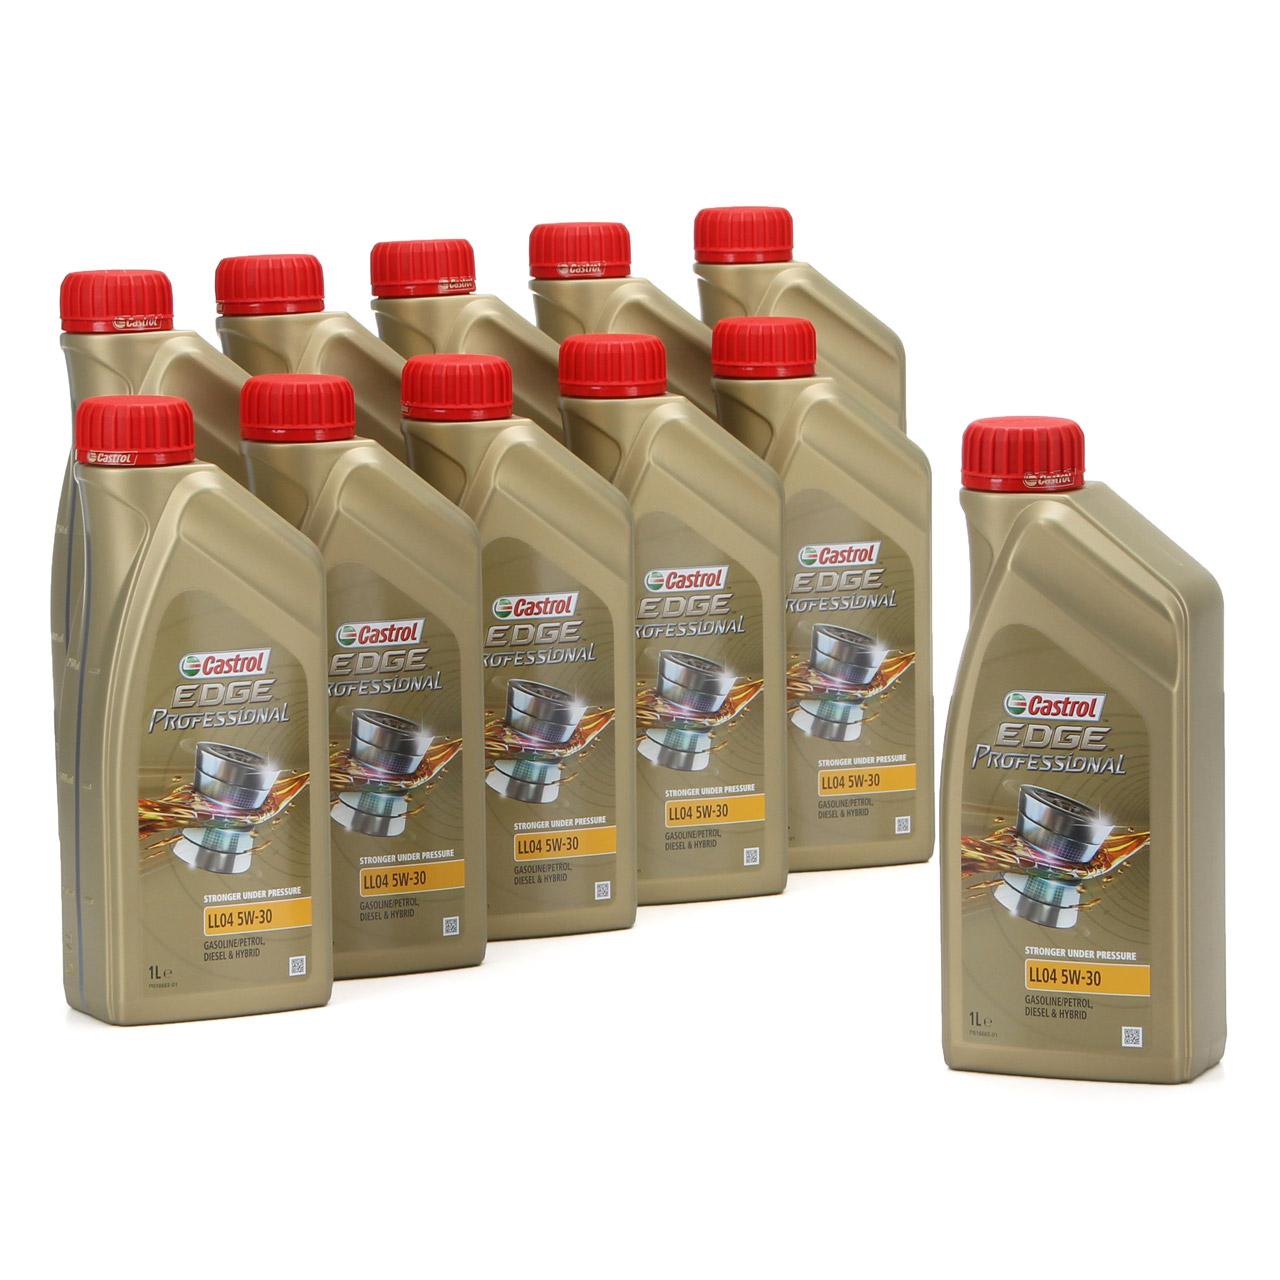 CASTROL EDGE Professional Motoröl Öl für BMW Longlife IV LL04 5W-30 - 11 Liter